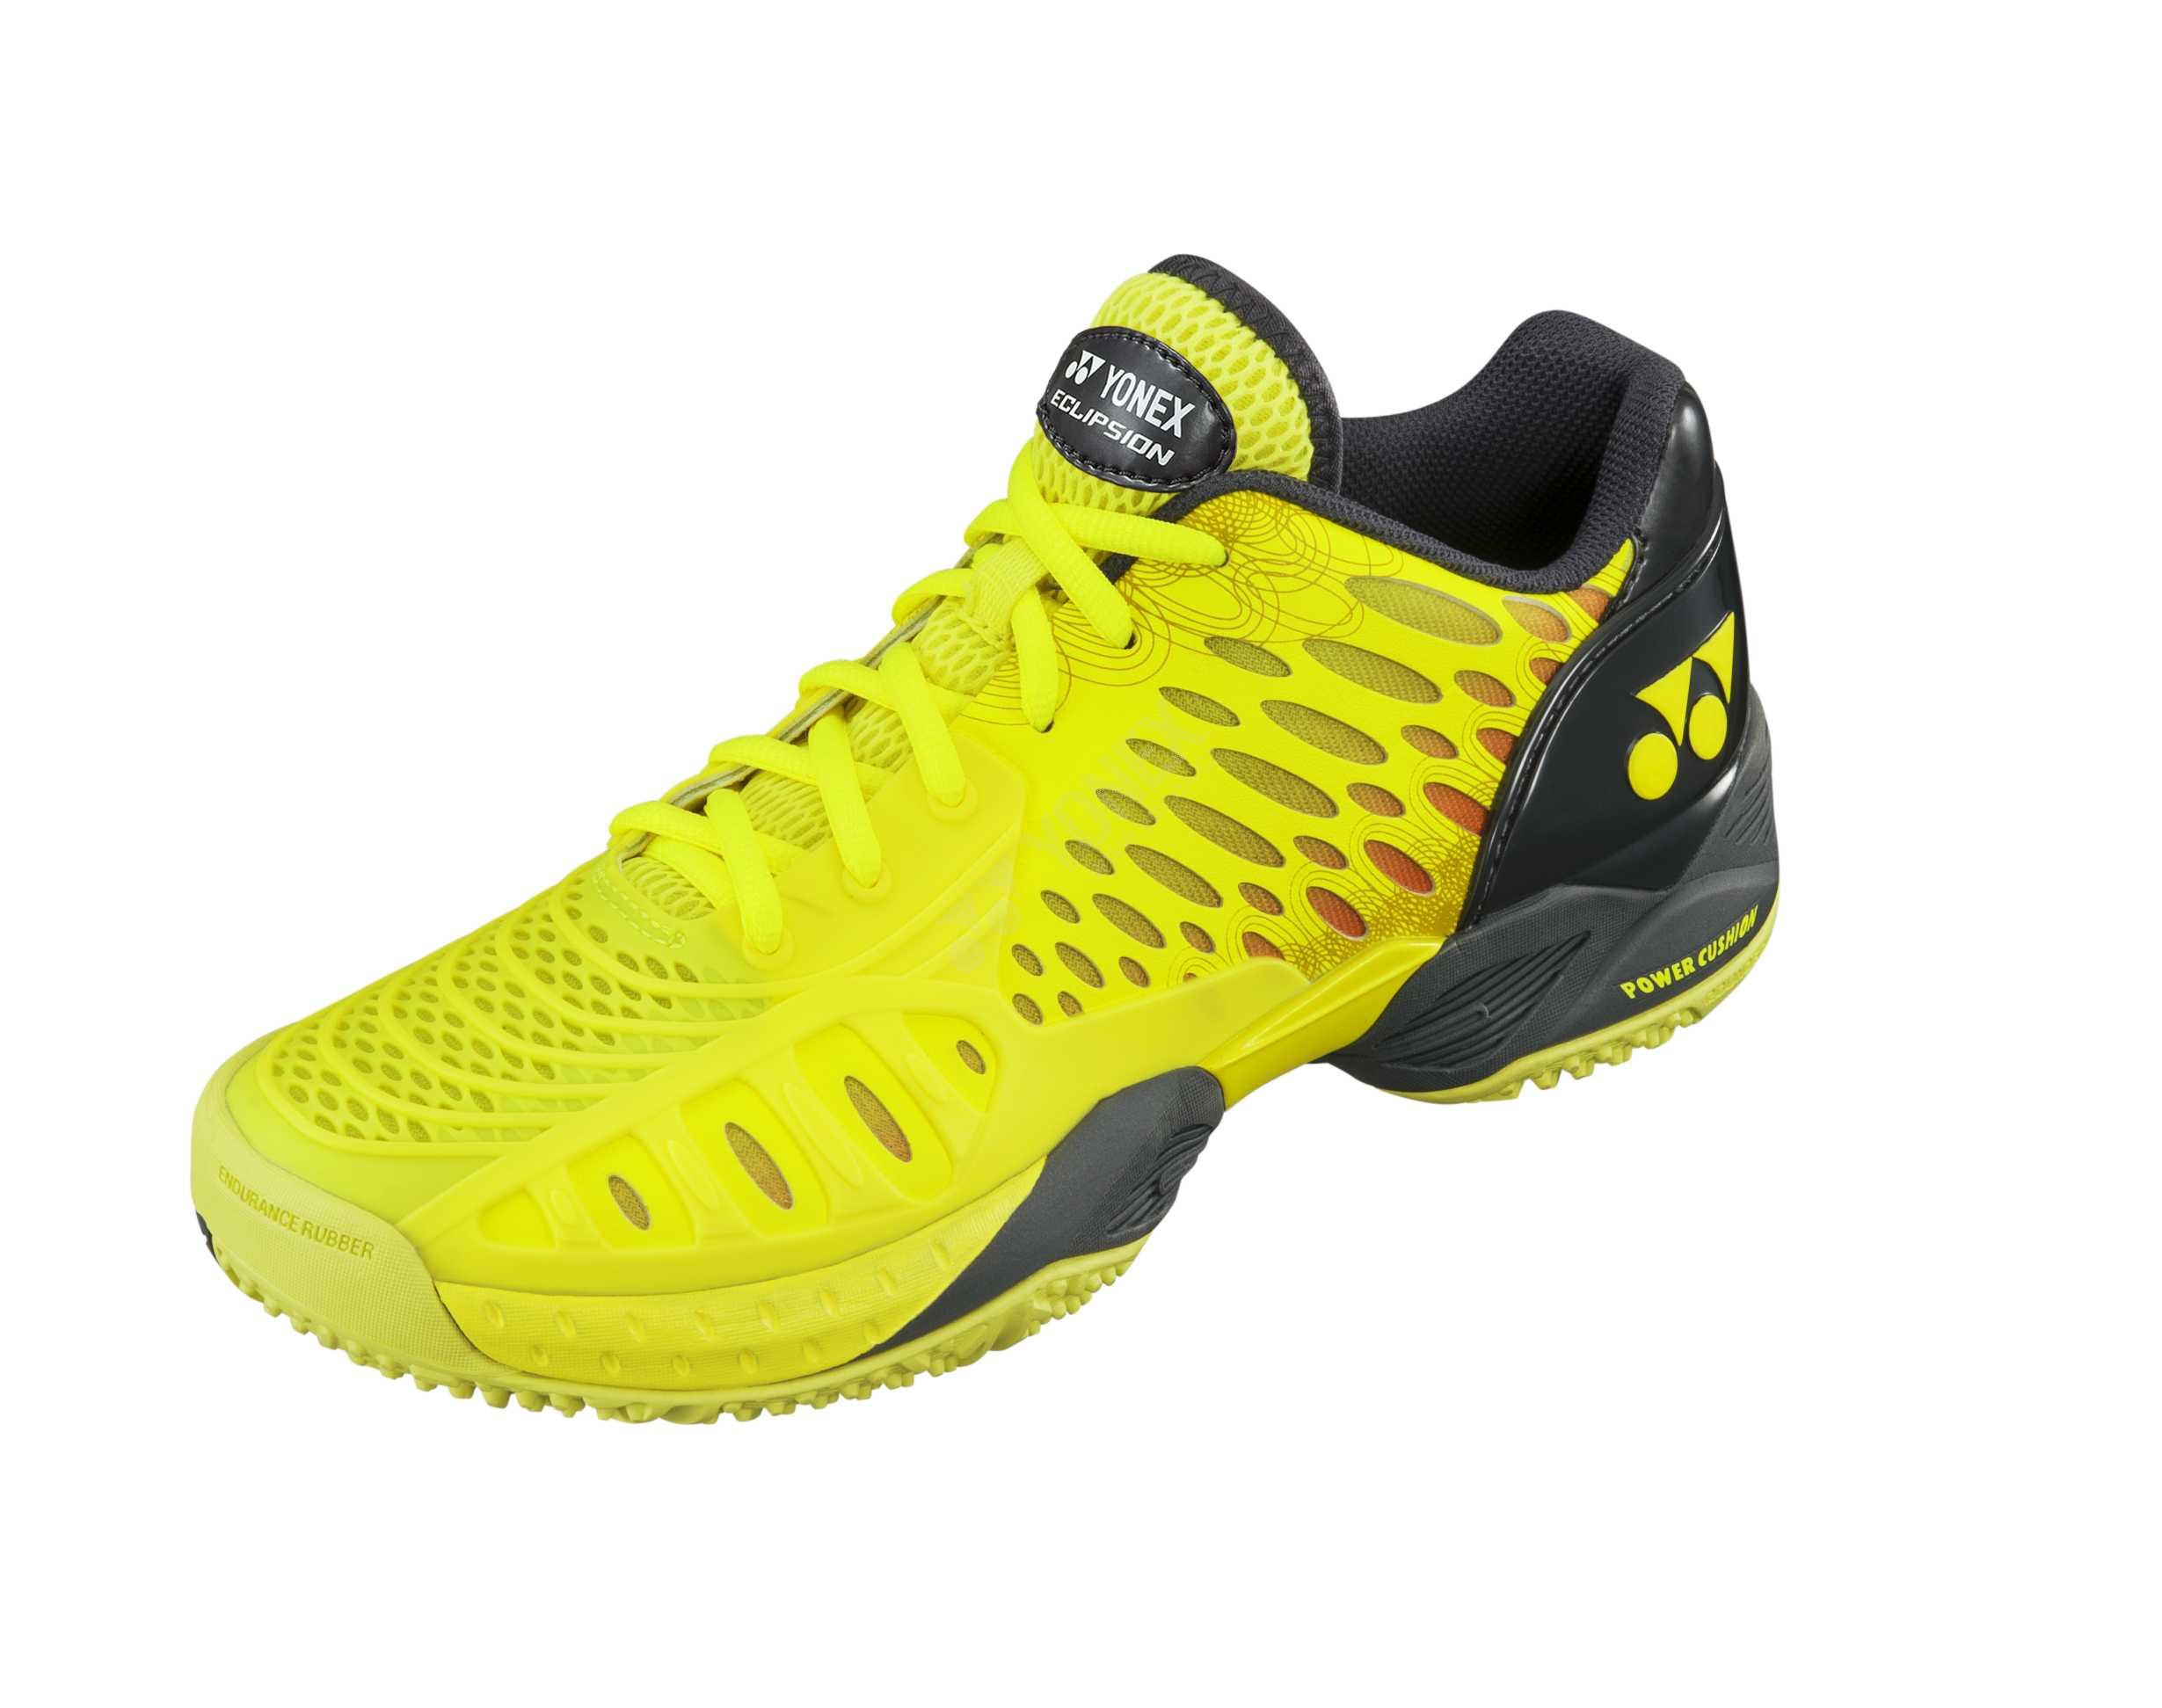 Tenisová obuv YONEX SHT ECLIPSION Clay